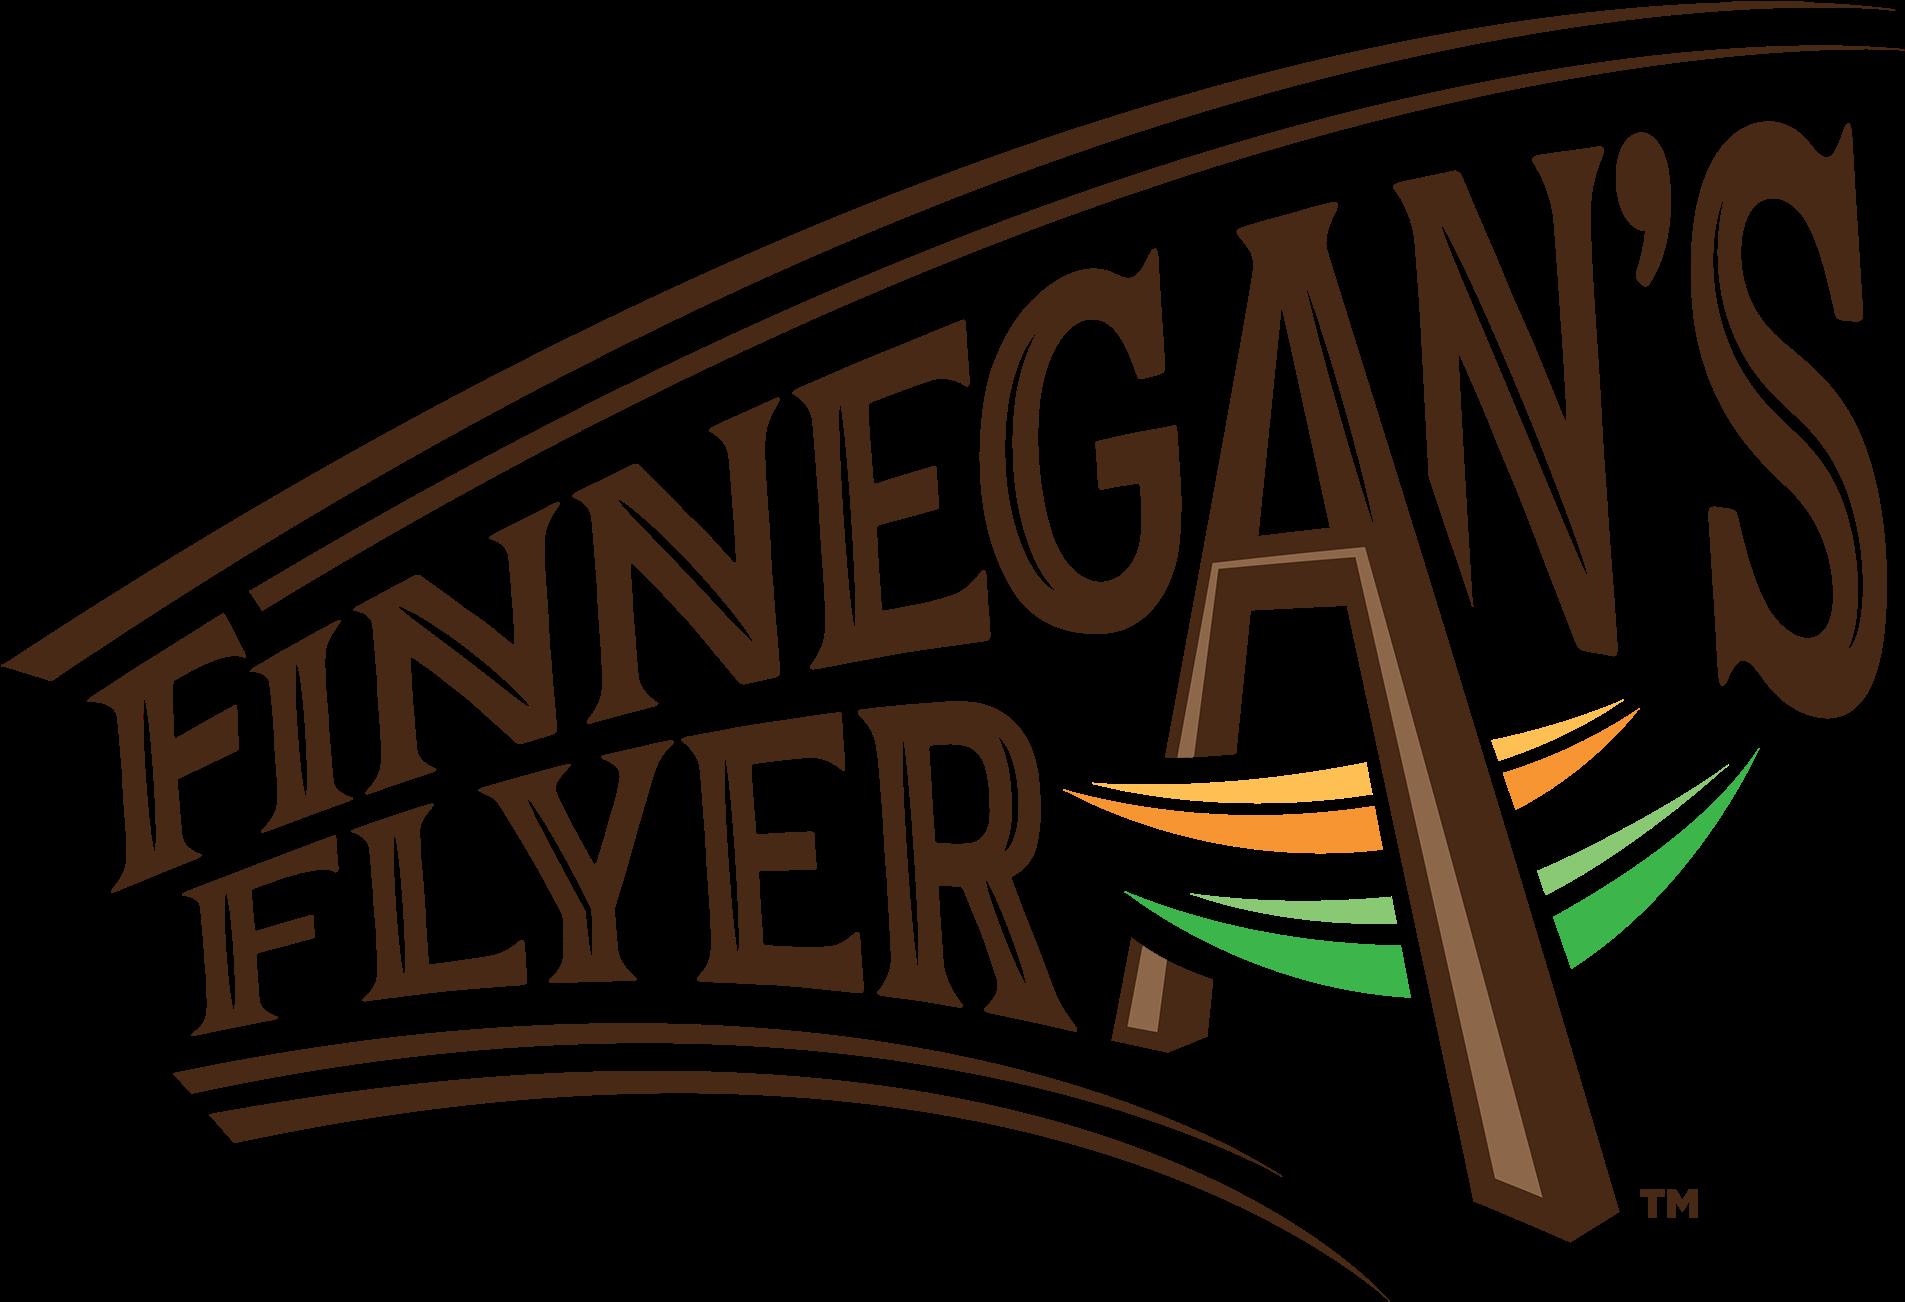 Bgw Finnegansflyertm Logo Cmyk.